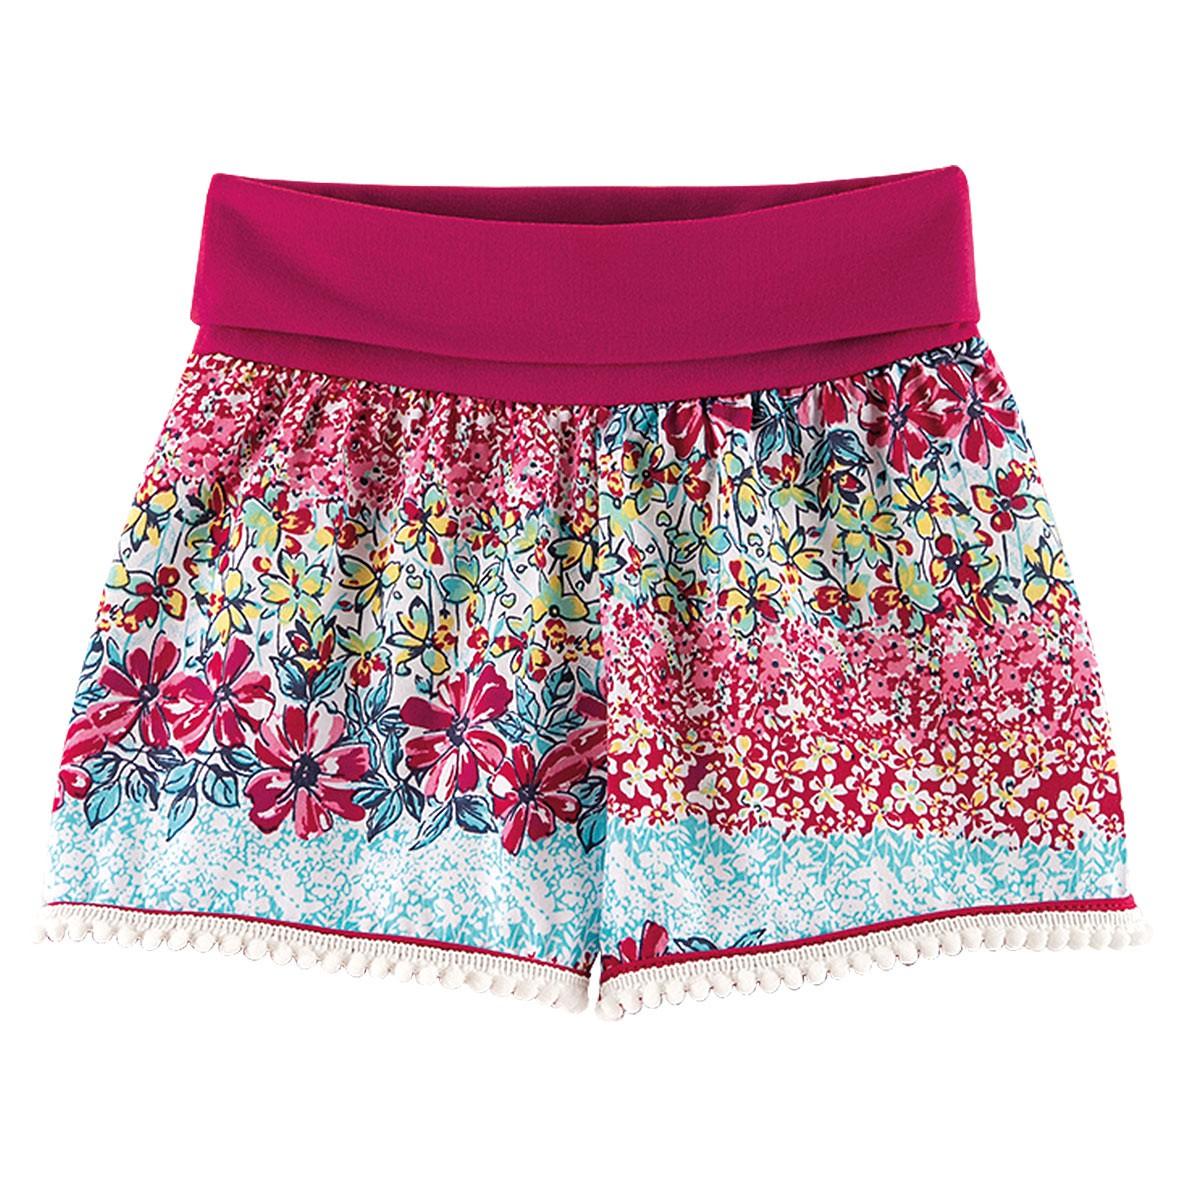 Kit 4 Shorts Infantil Menina Roupas De Verão